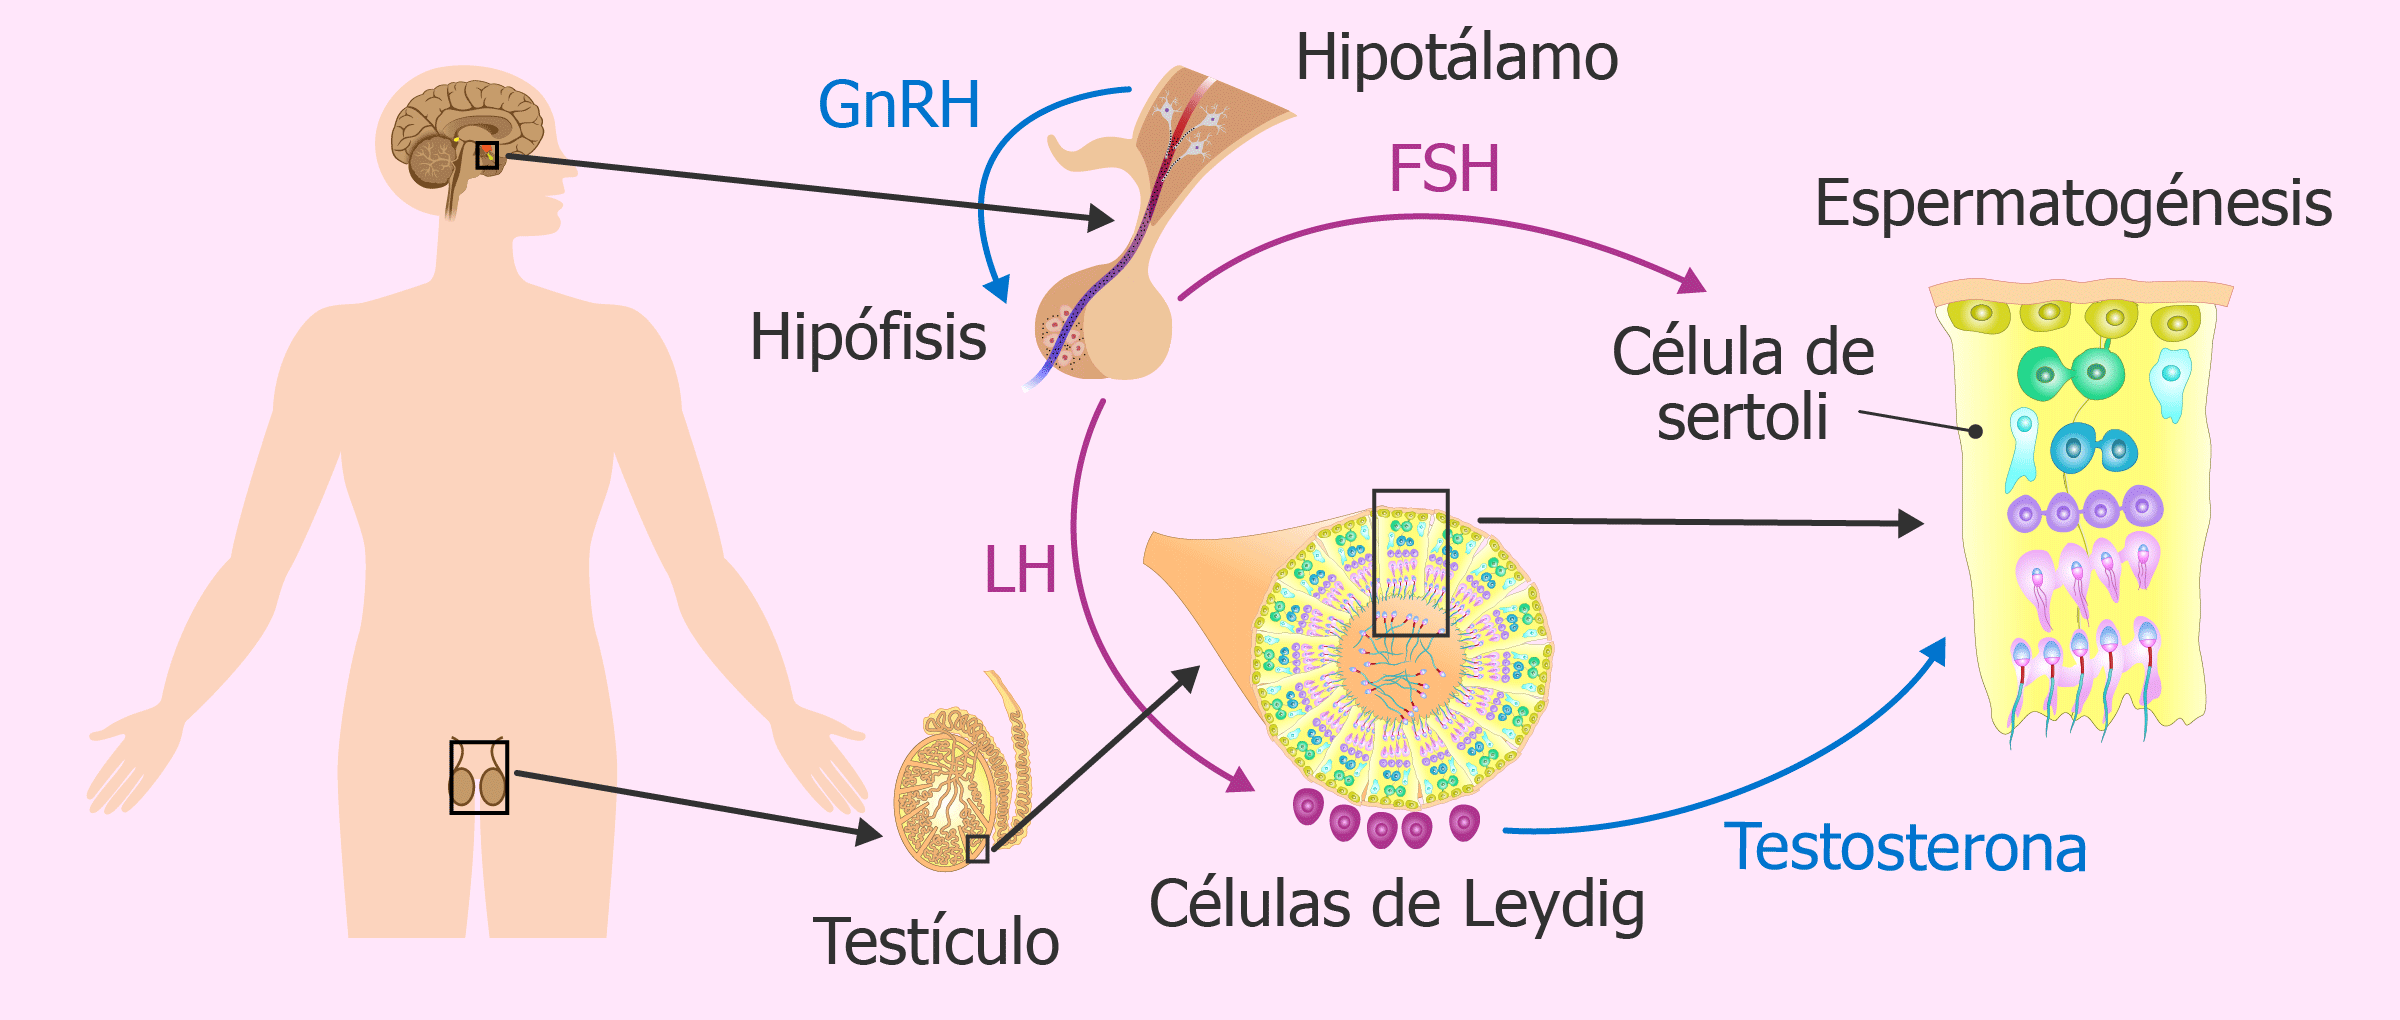 Producción de hormonas masculinas